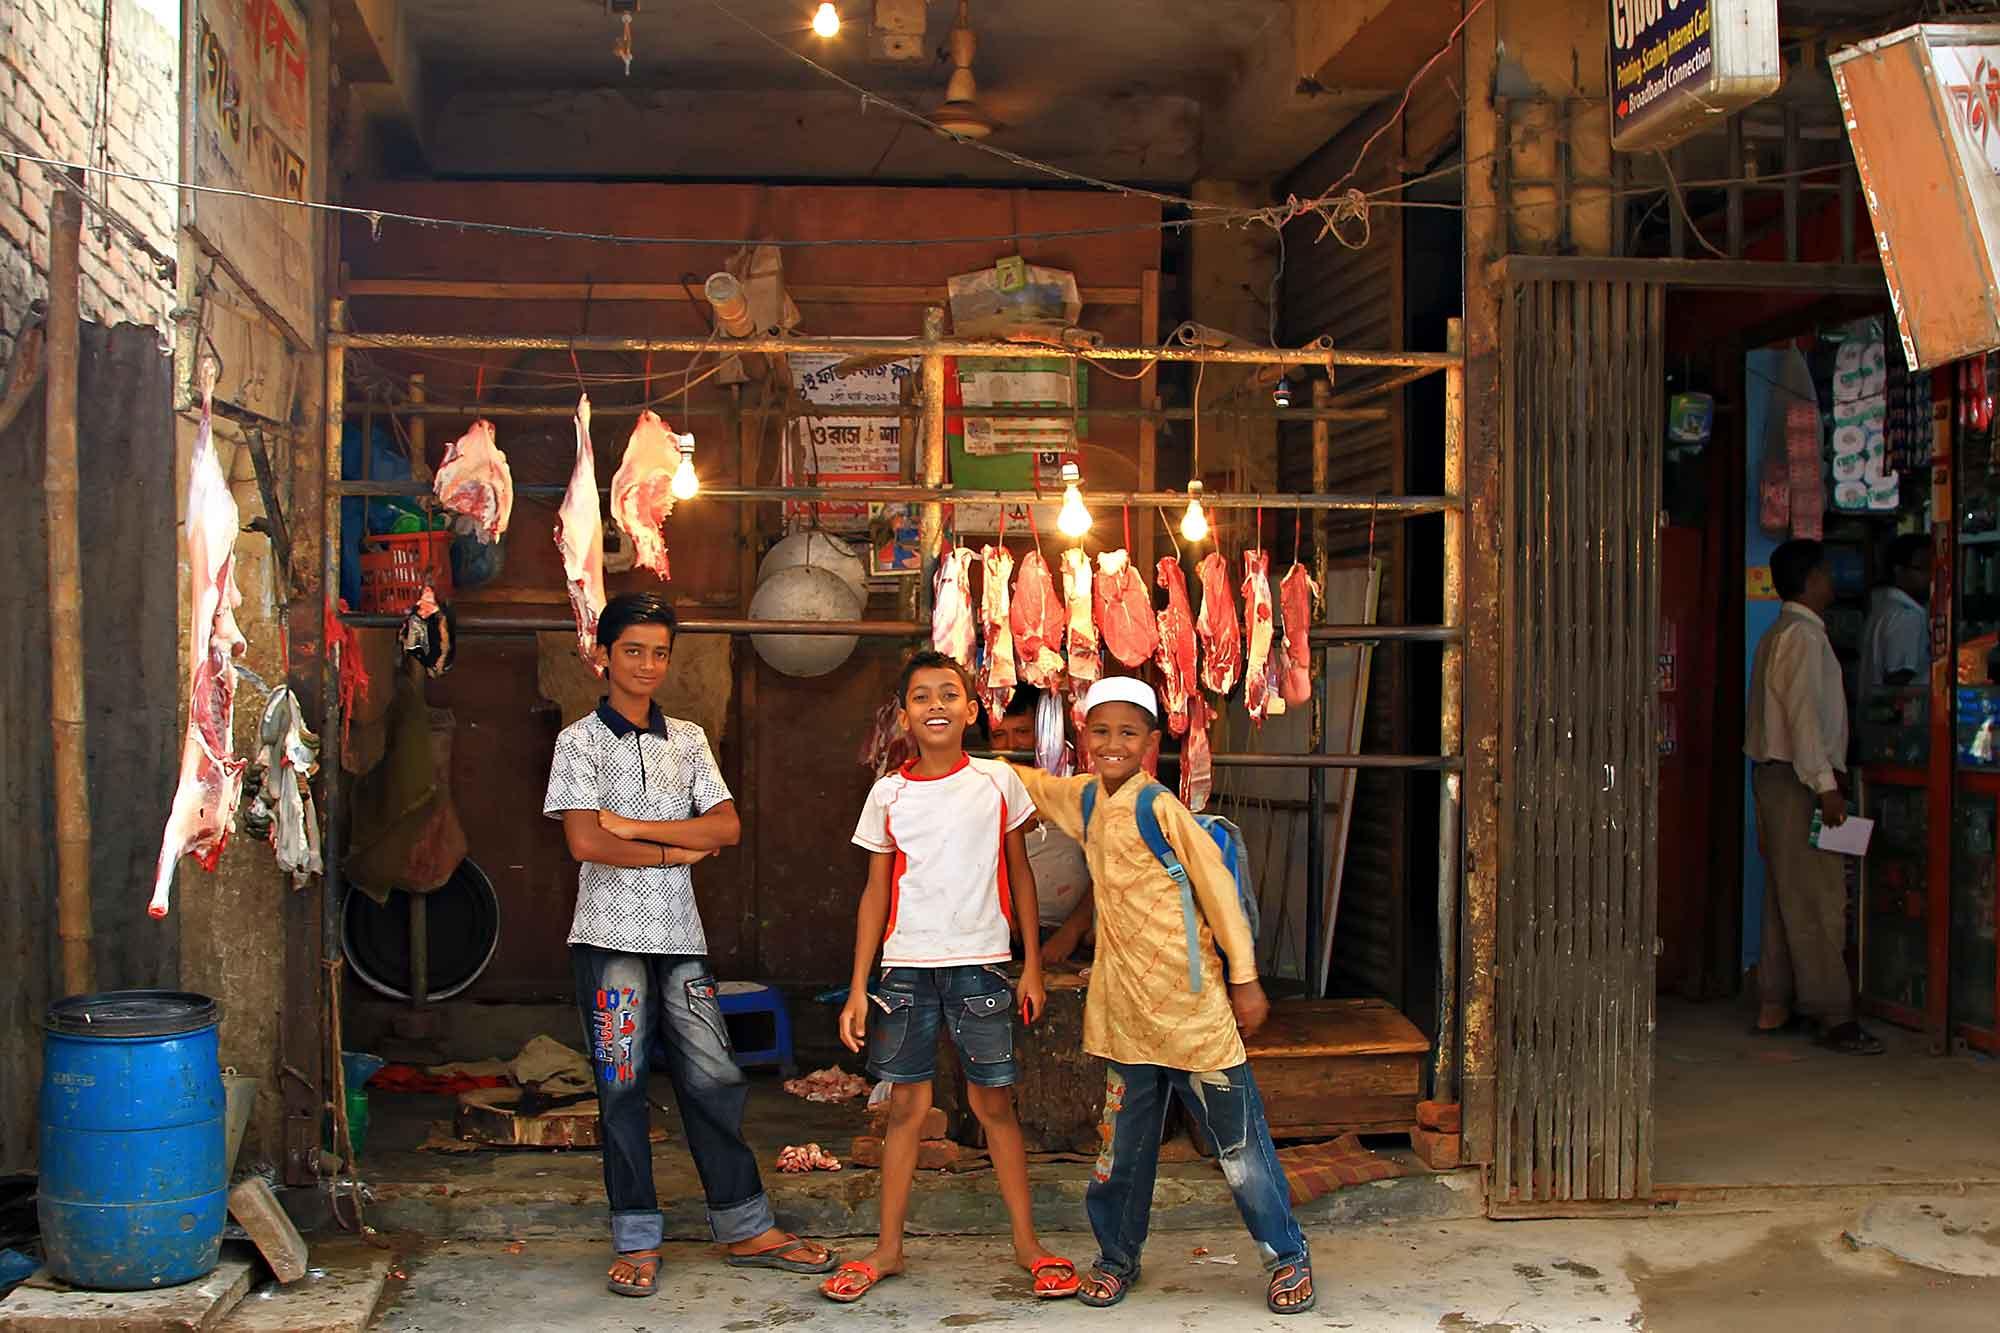 Meat shop in Old Dhaka, Bangladesh. © Ulli Maier & Nisa Maier